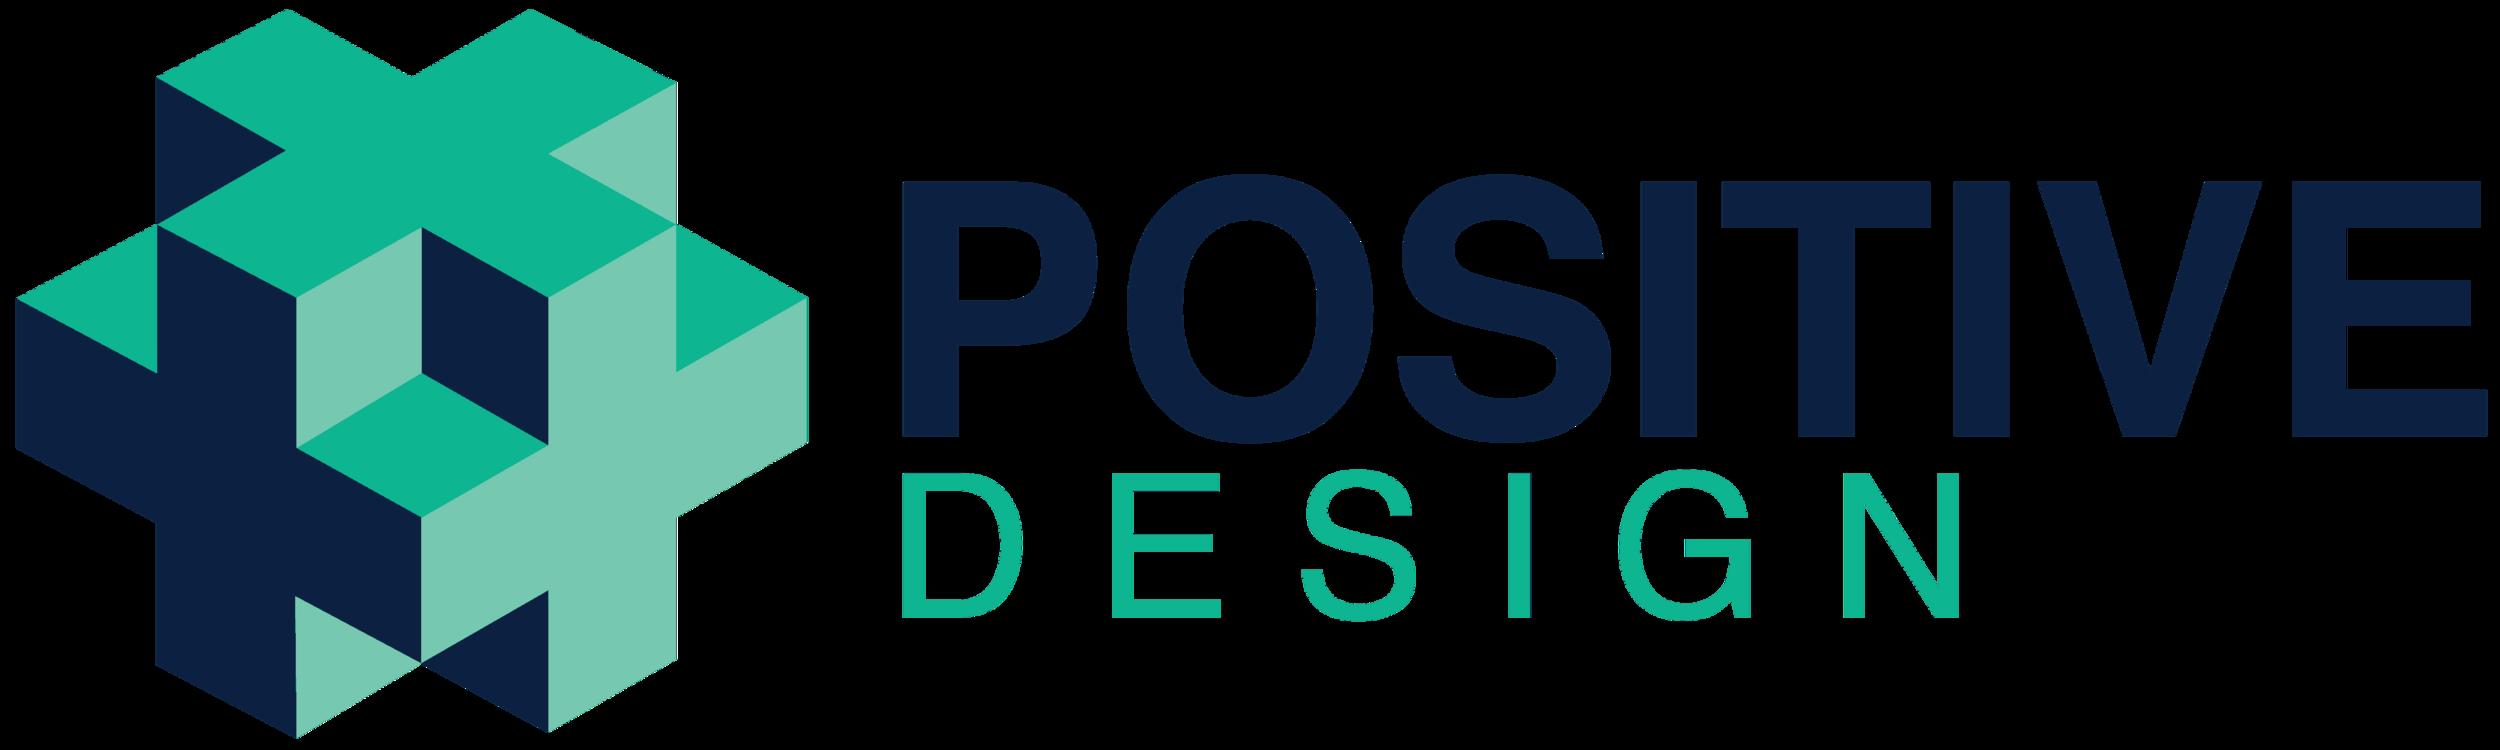 Positive-Design-Logo-Aqua-Large-01.png